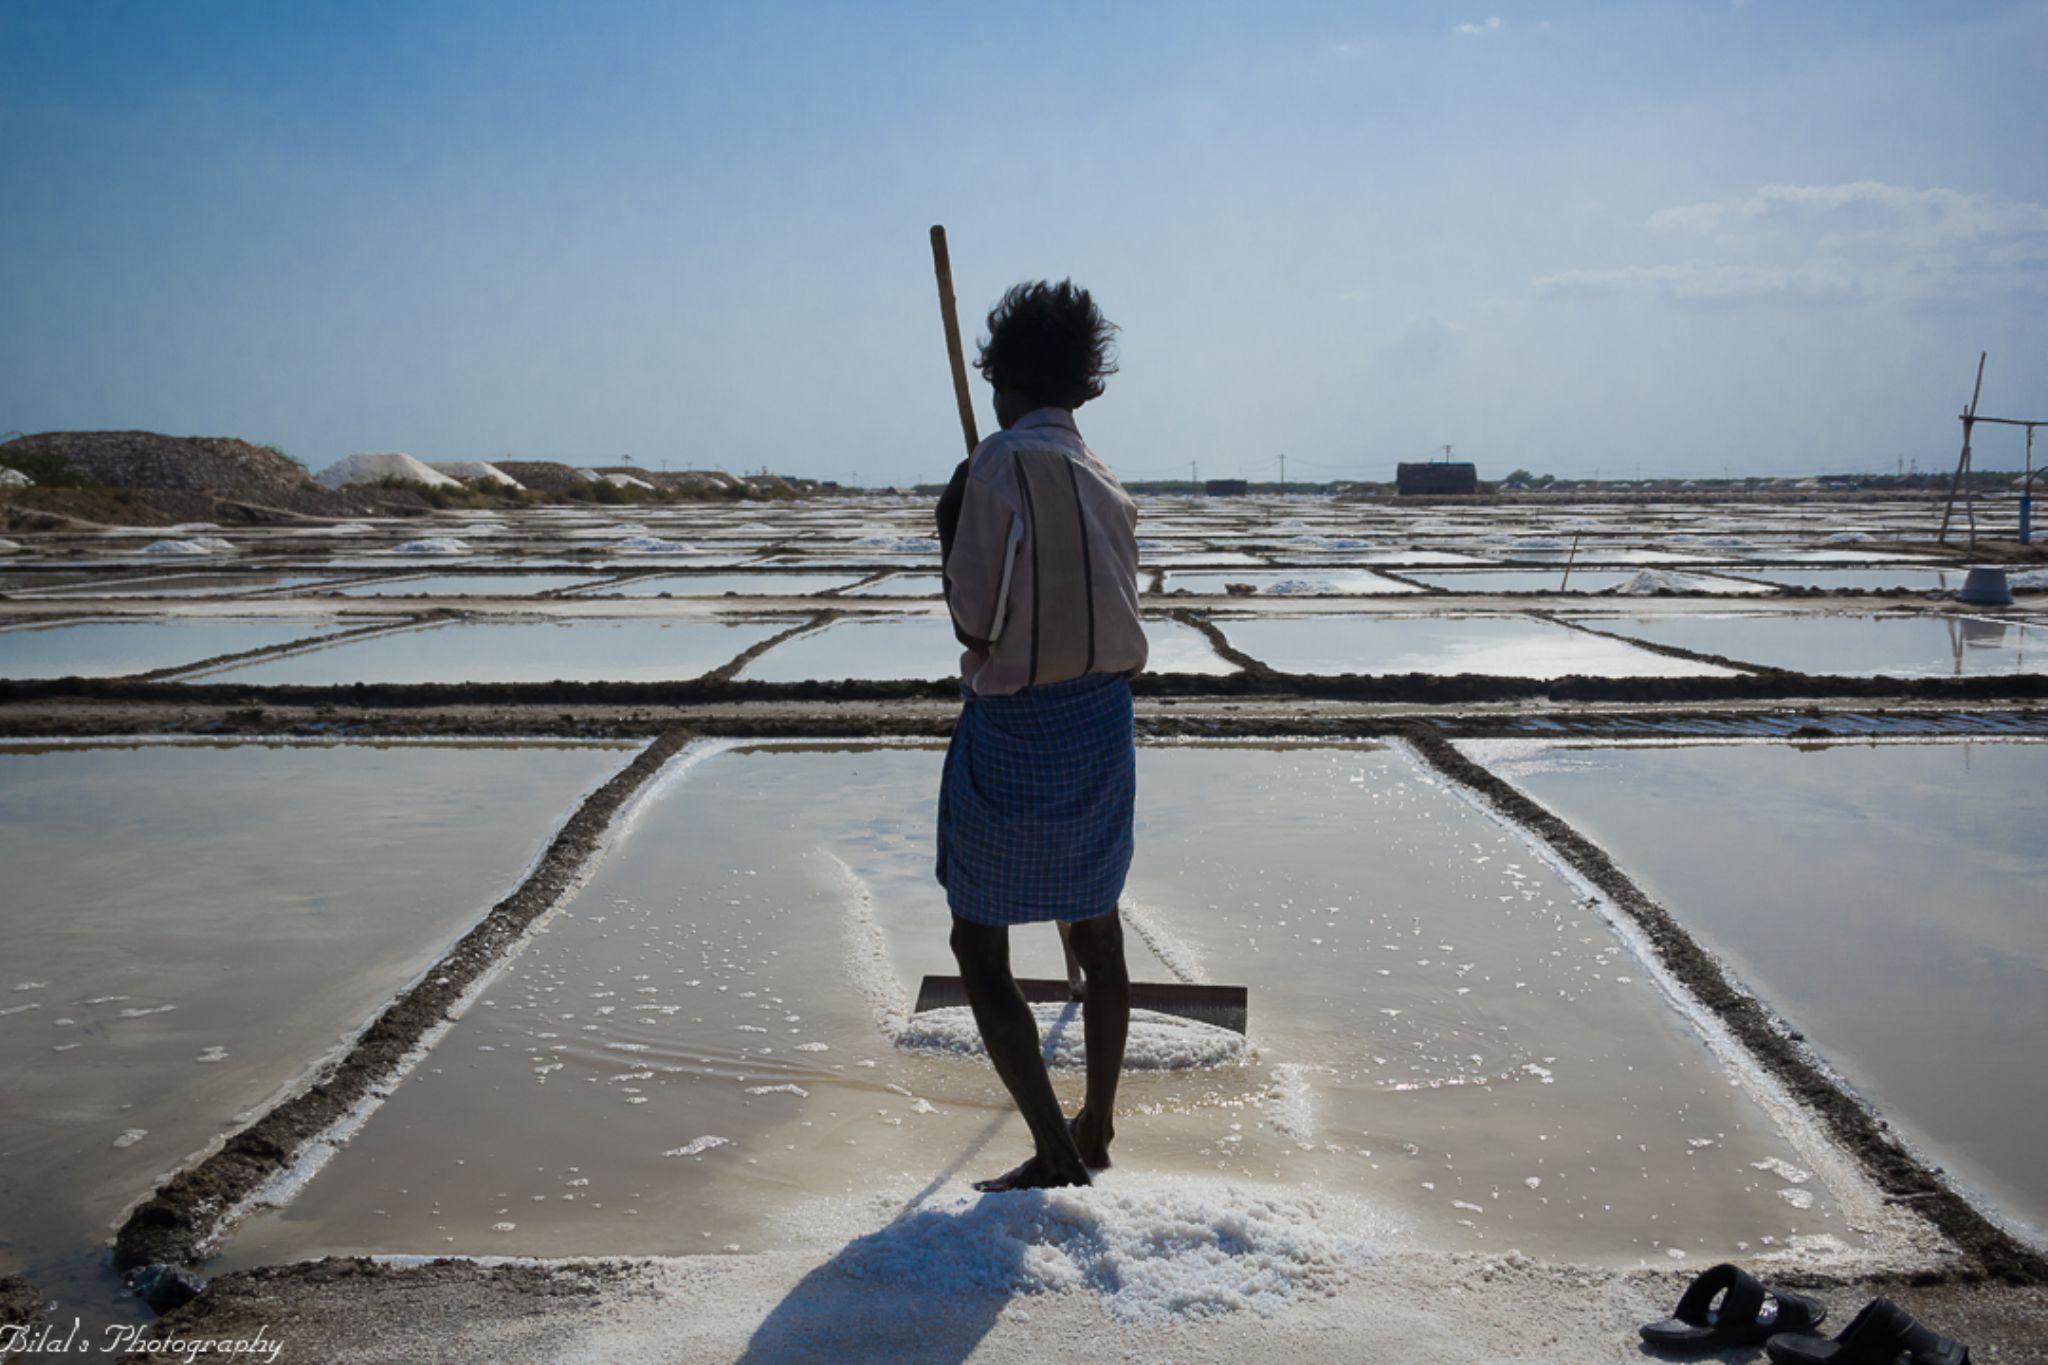 Salt Worker, Vedaranyam by bilal05